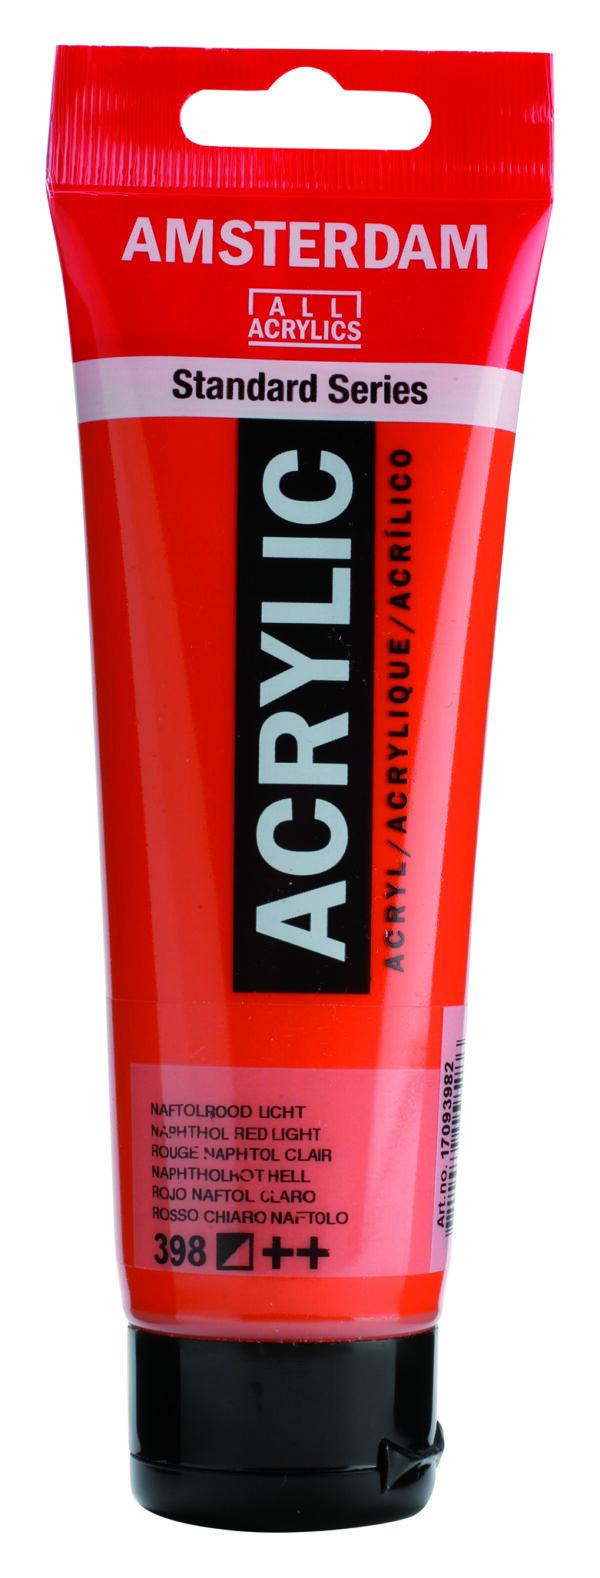 Ams std 398 Naphtol red Light - 120 ml